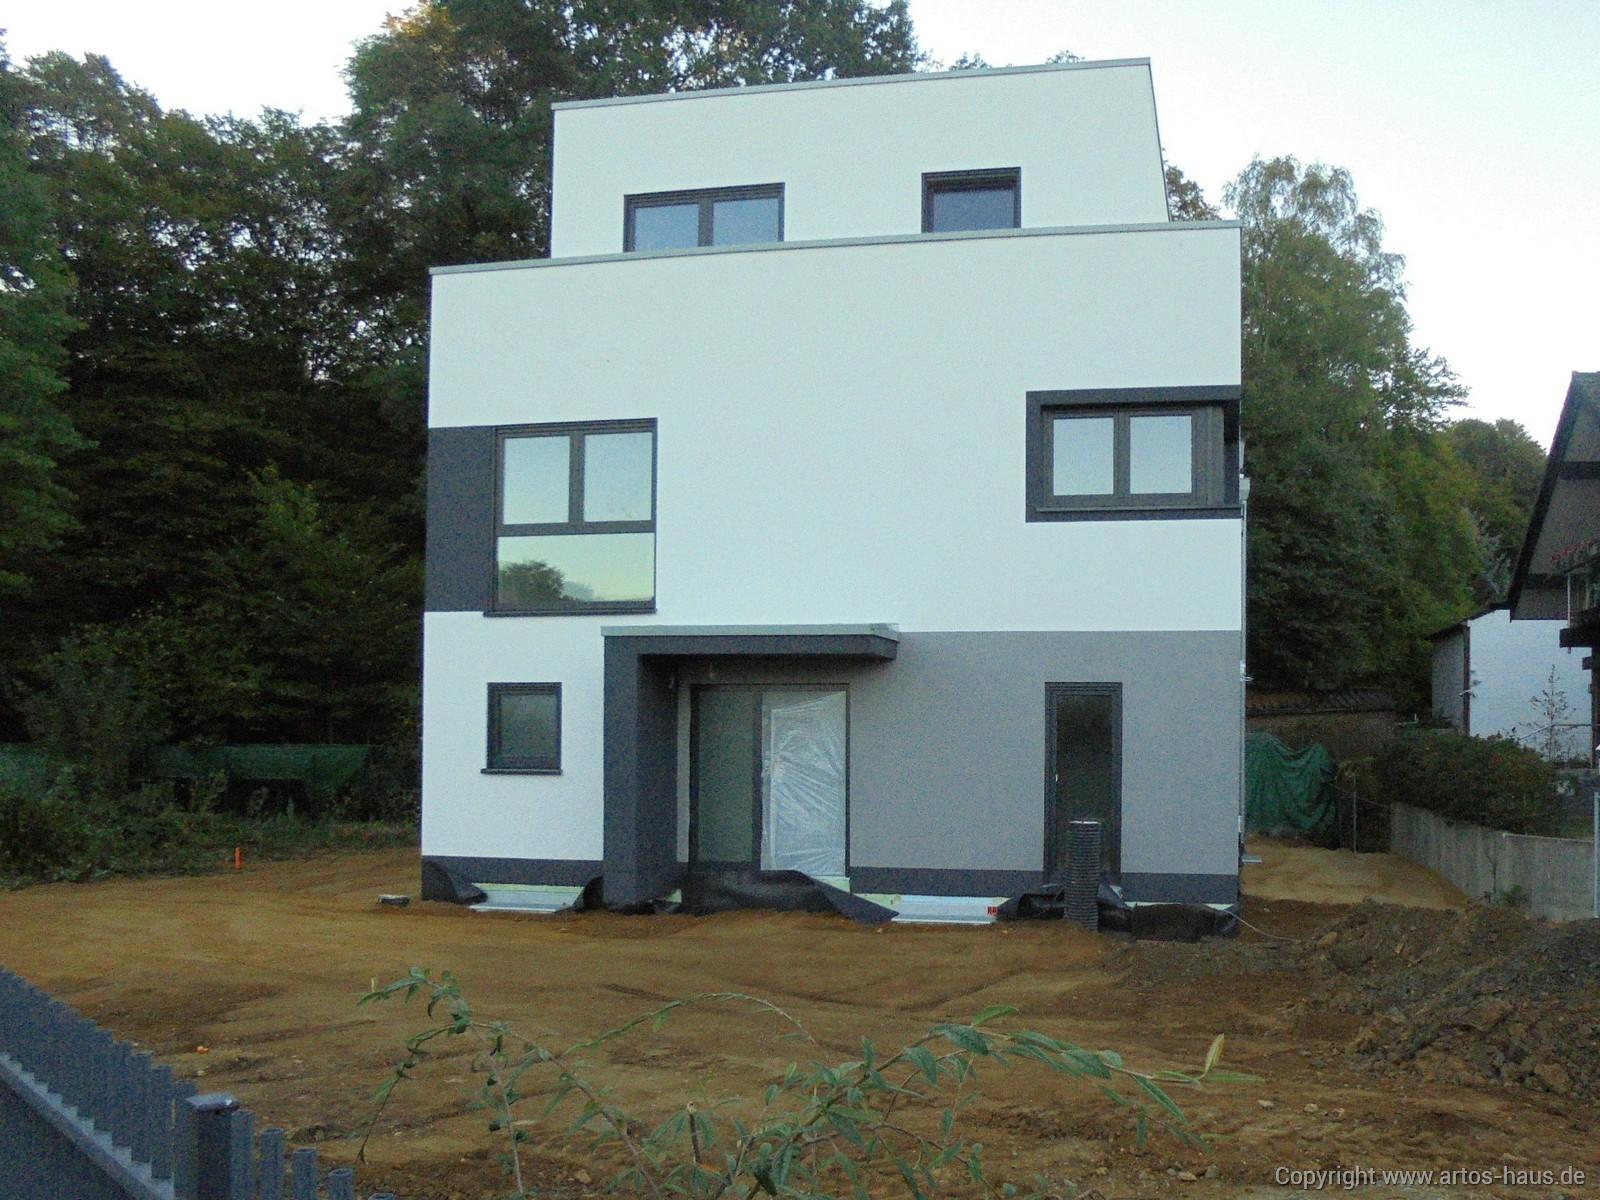 artos-haus-bv-bonn-ippendorf-30